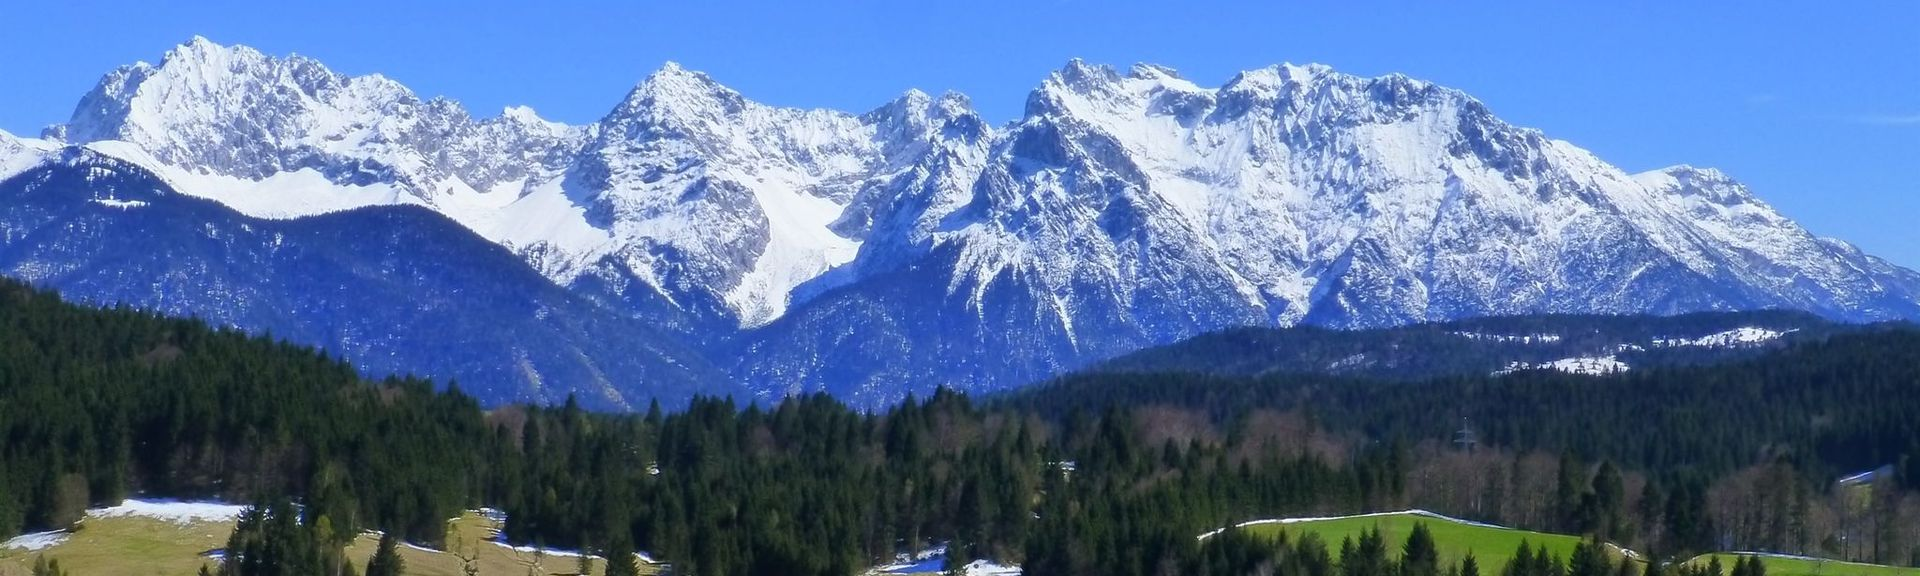 Unterammergau, Bavaria, Germany